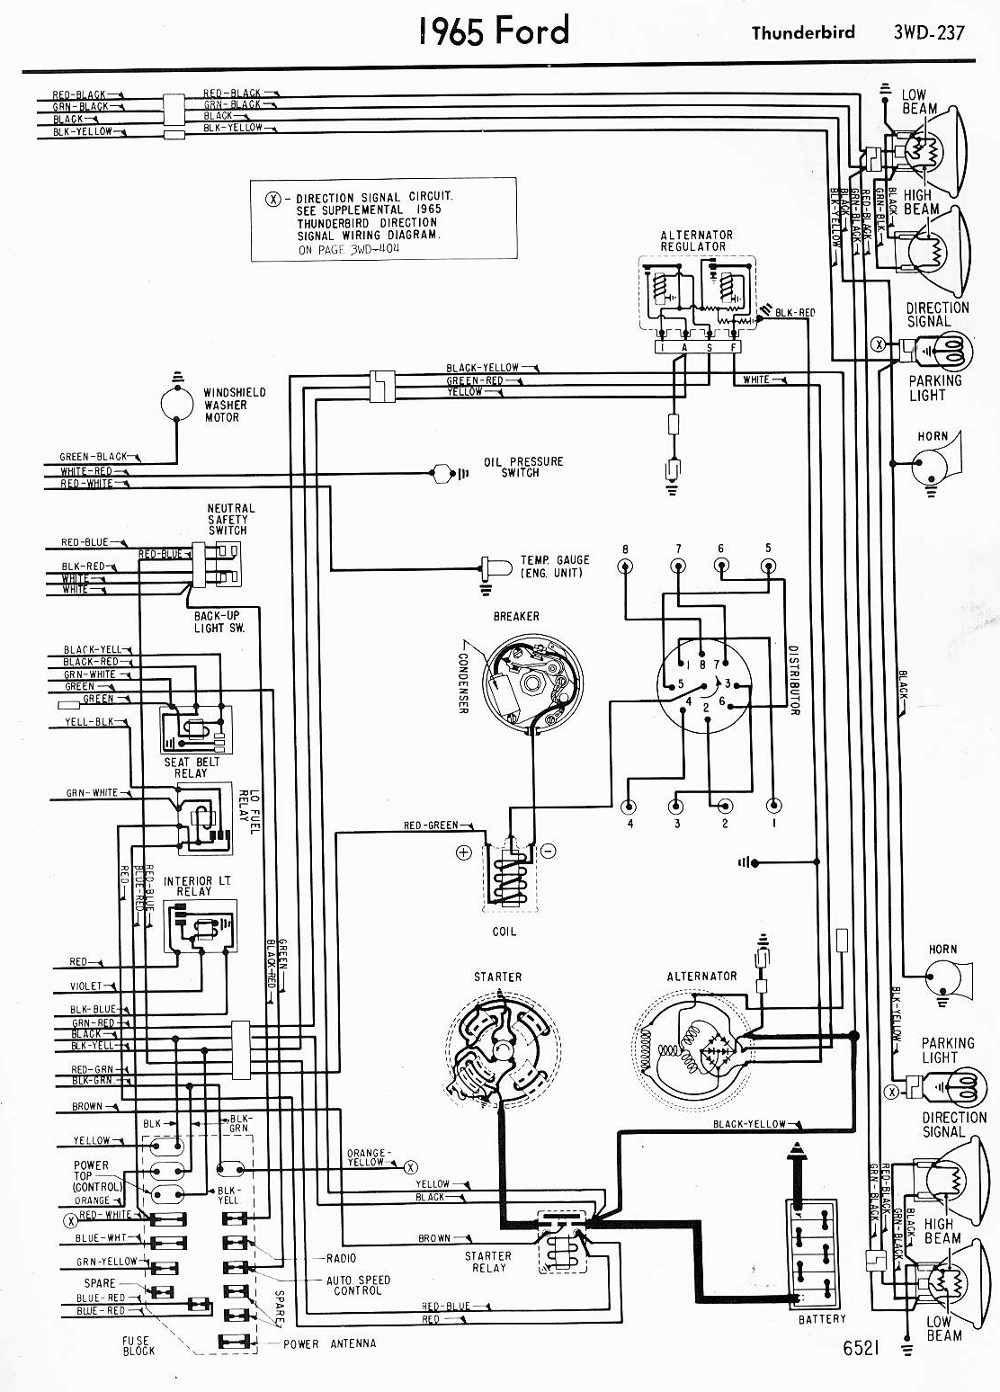 2002 Thunderbird Wiring Diagram - Cars Wiring Diagram